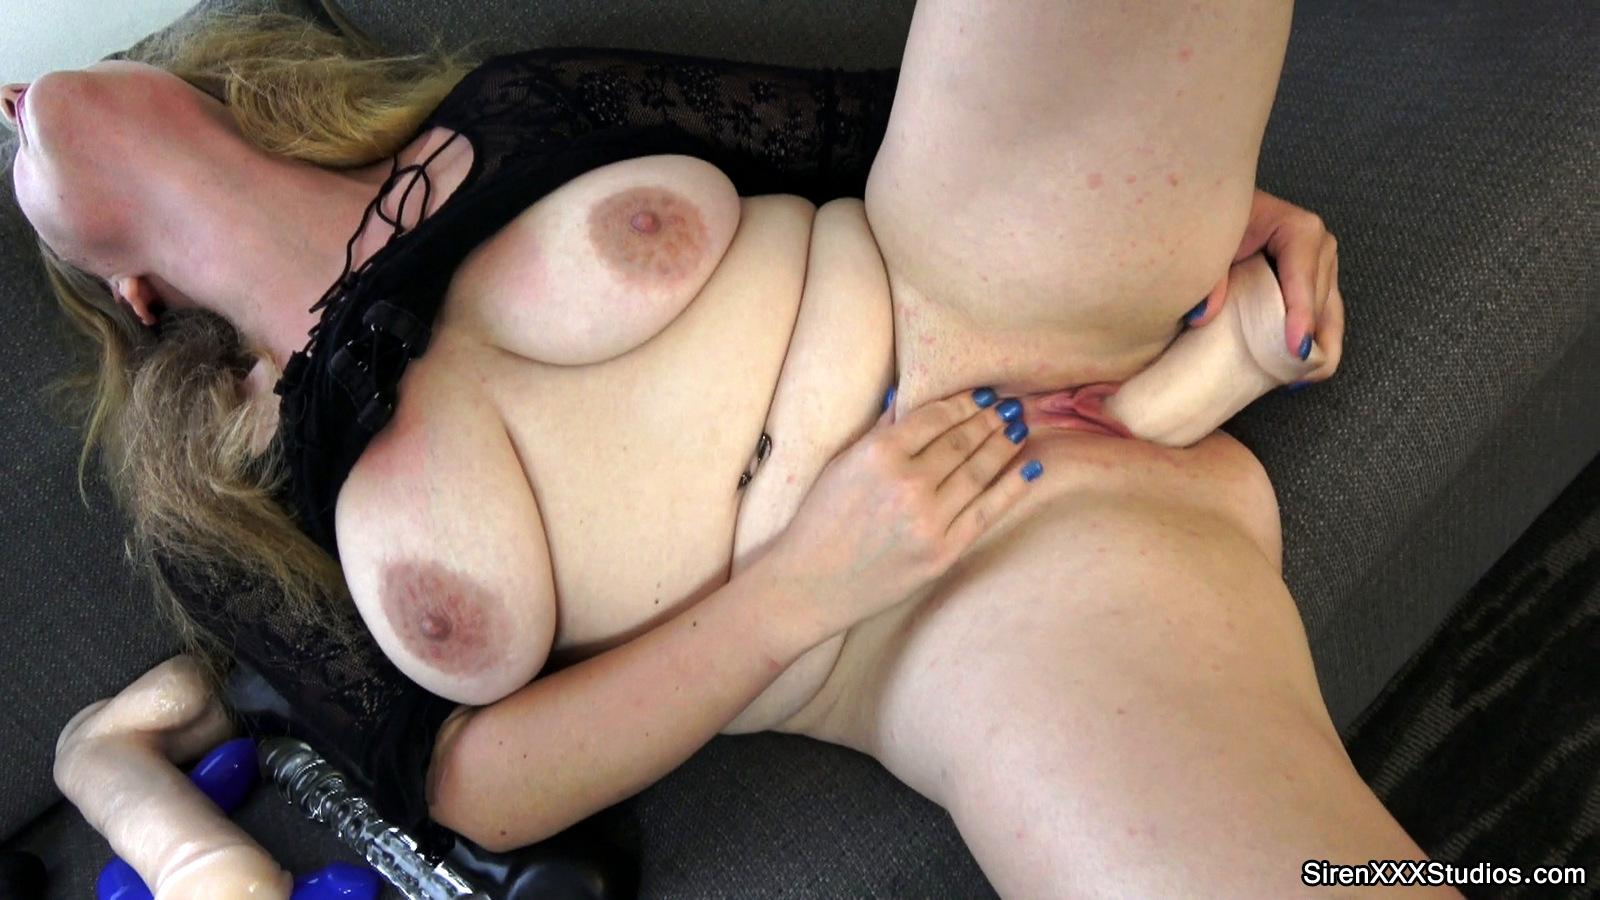 big fat stretched pussy holes xxx